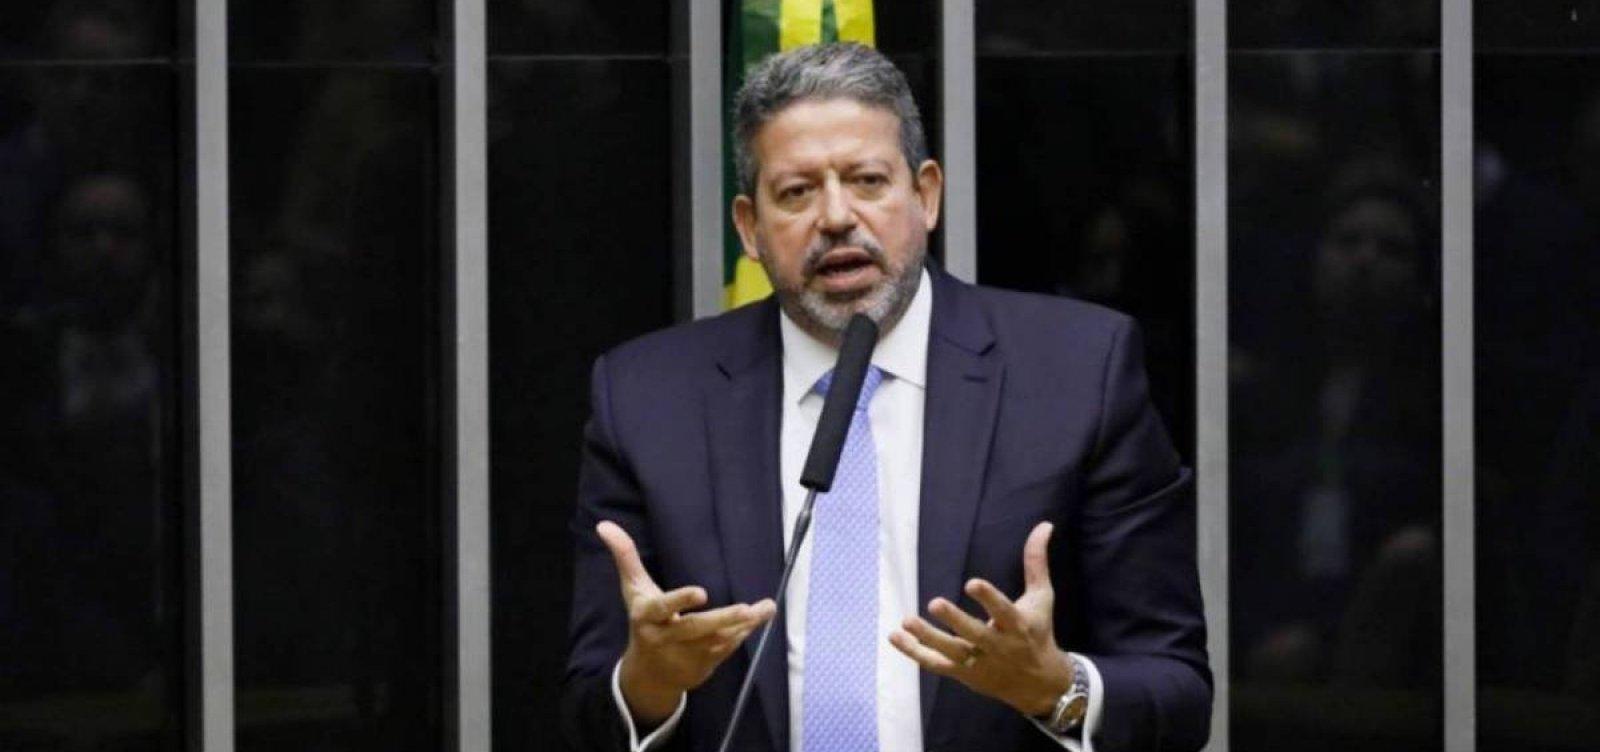 [Lira chama governadores para diálogo sobre pandemia após Bolsonaro atacar medidas restritivas]